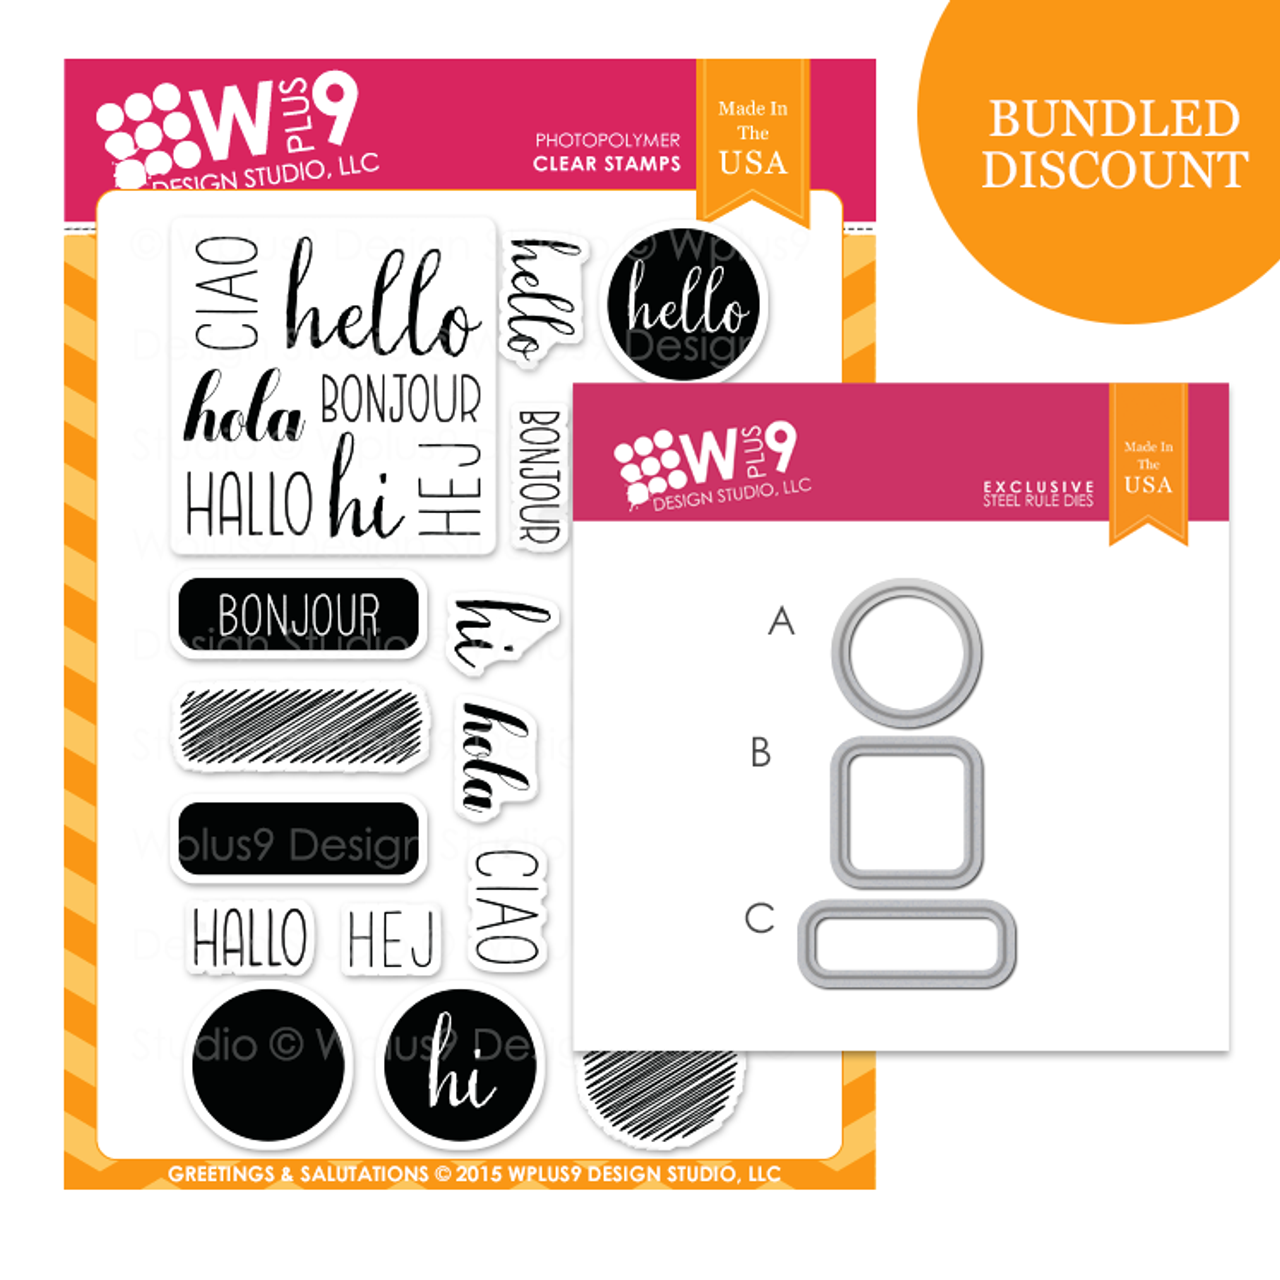 Greetings salutations bundle wplus9 design studio llc greetings salutations bundle m4hsunfo